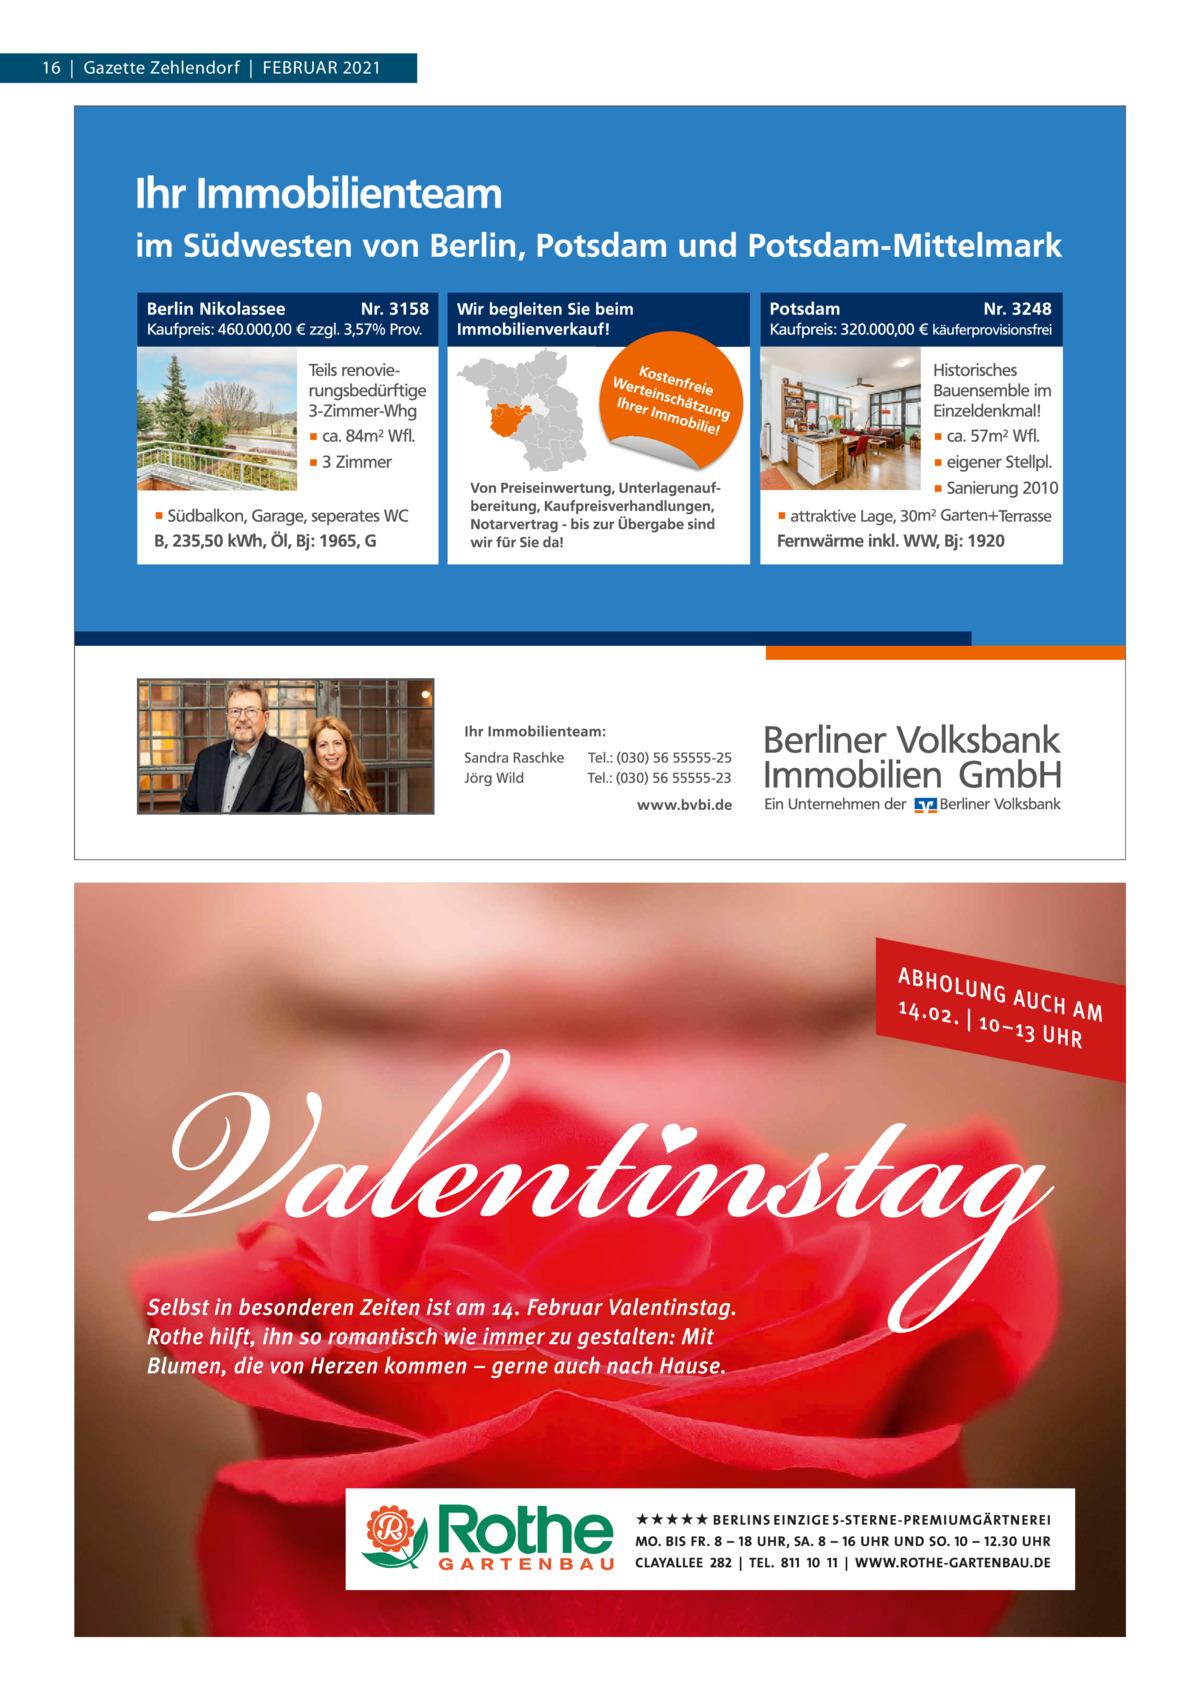 16 Gazette Zehlendorf FEBrUAr 2021